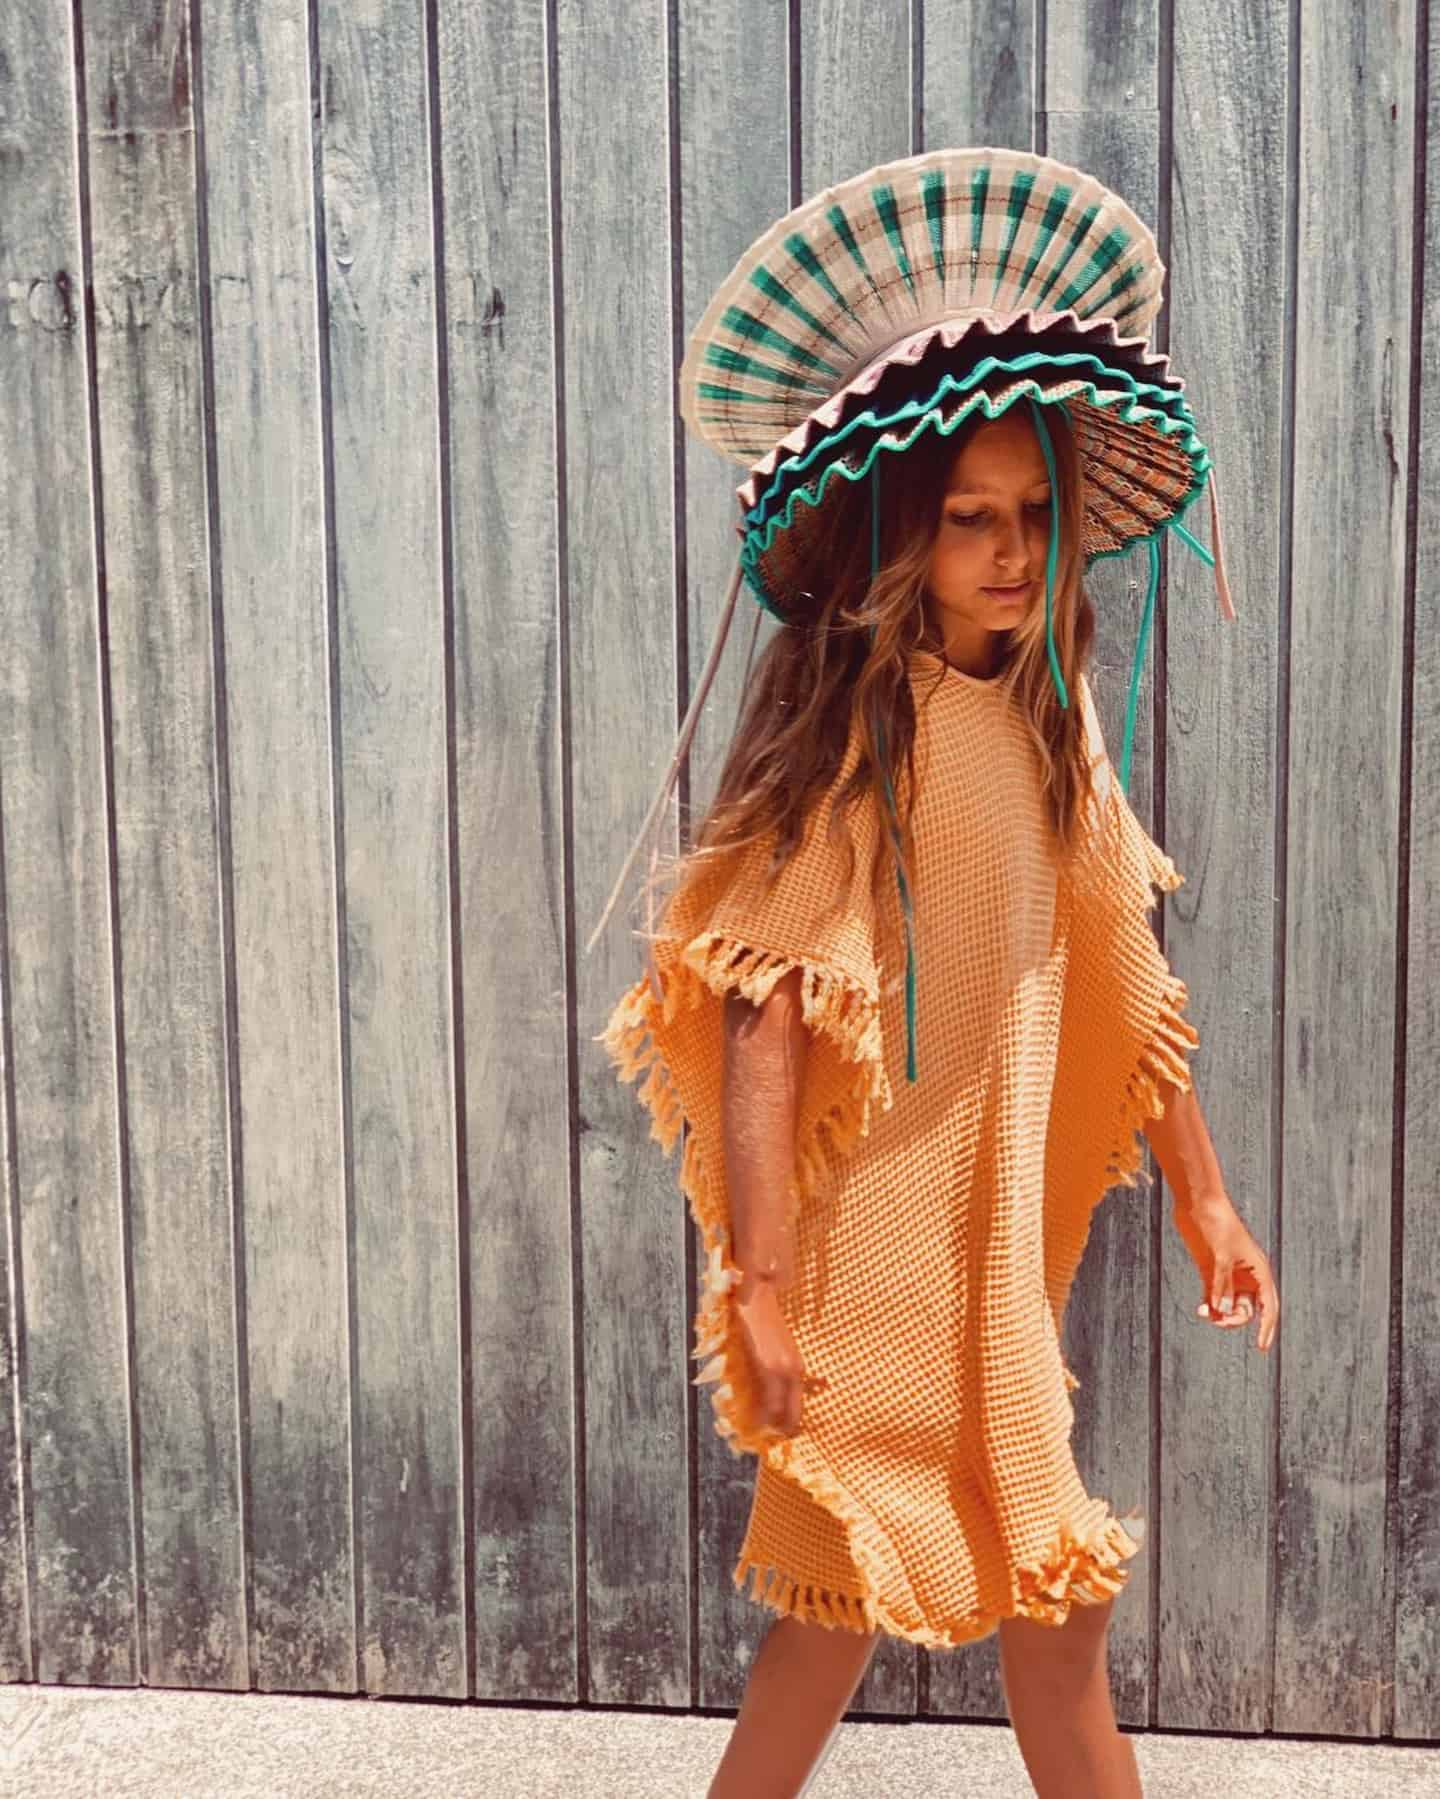 Lorna Murray capri hat for children